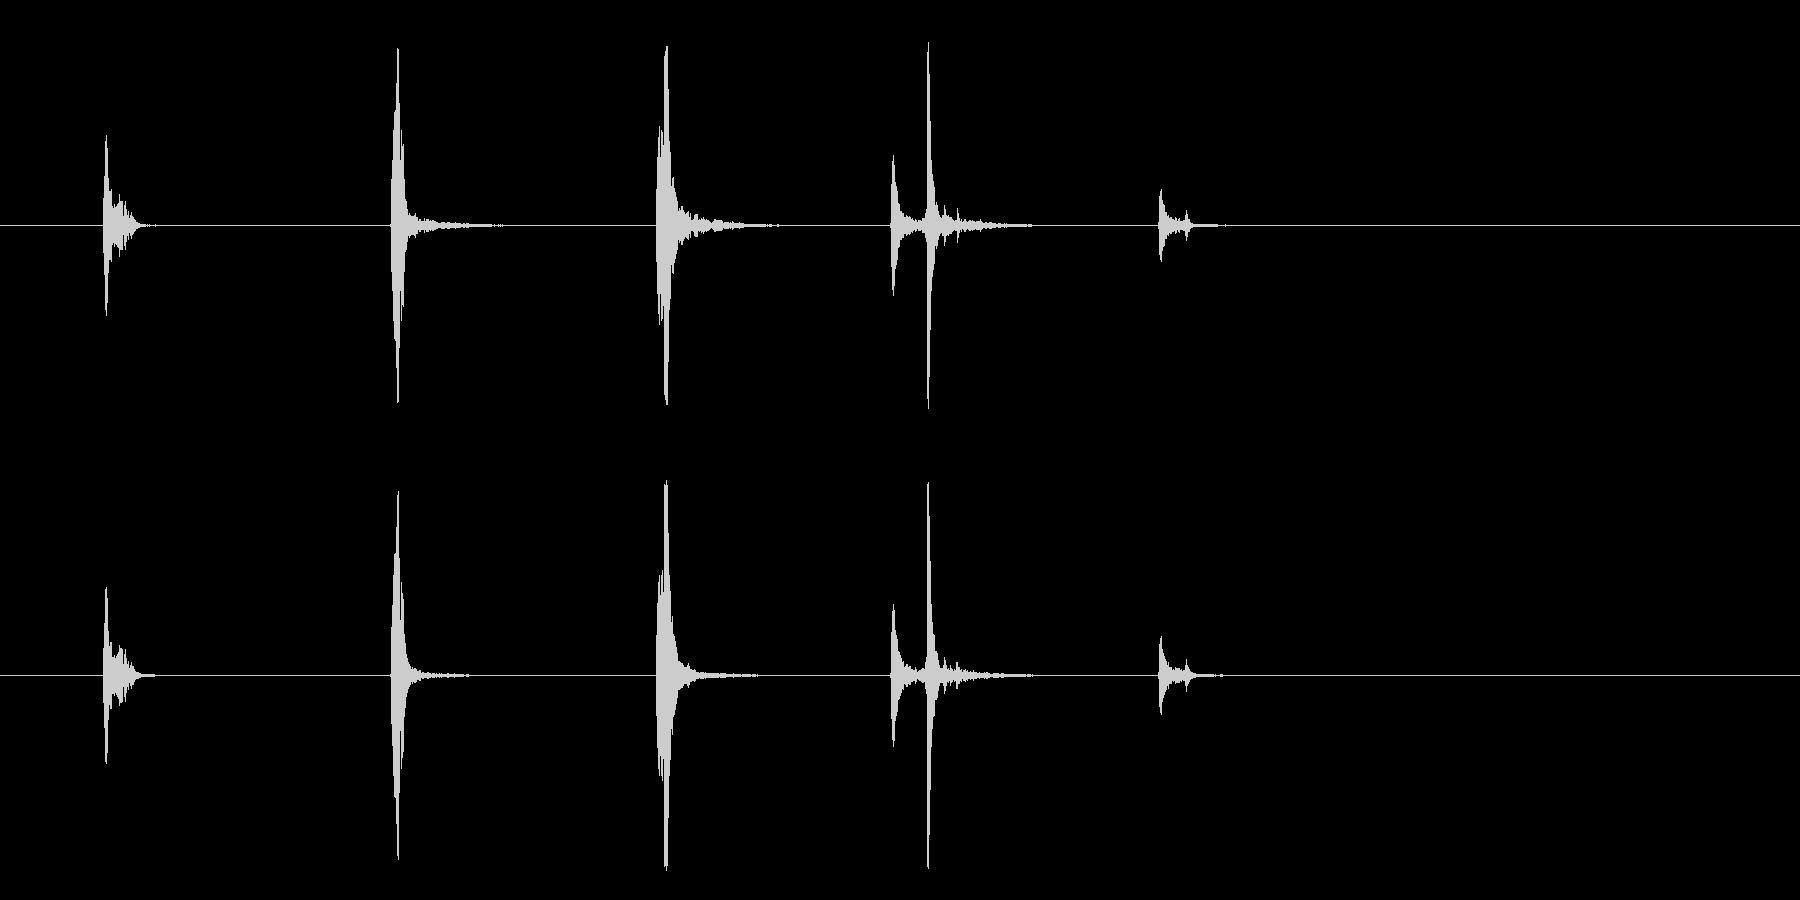 【SE】ナイフ 当てる音  擦る音の未再生の波形